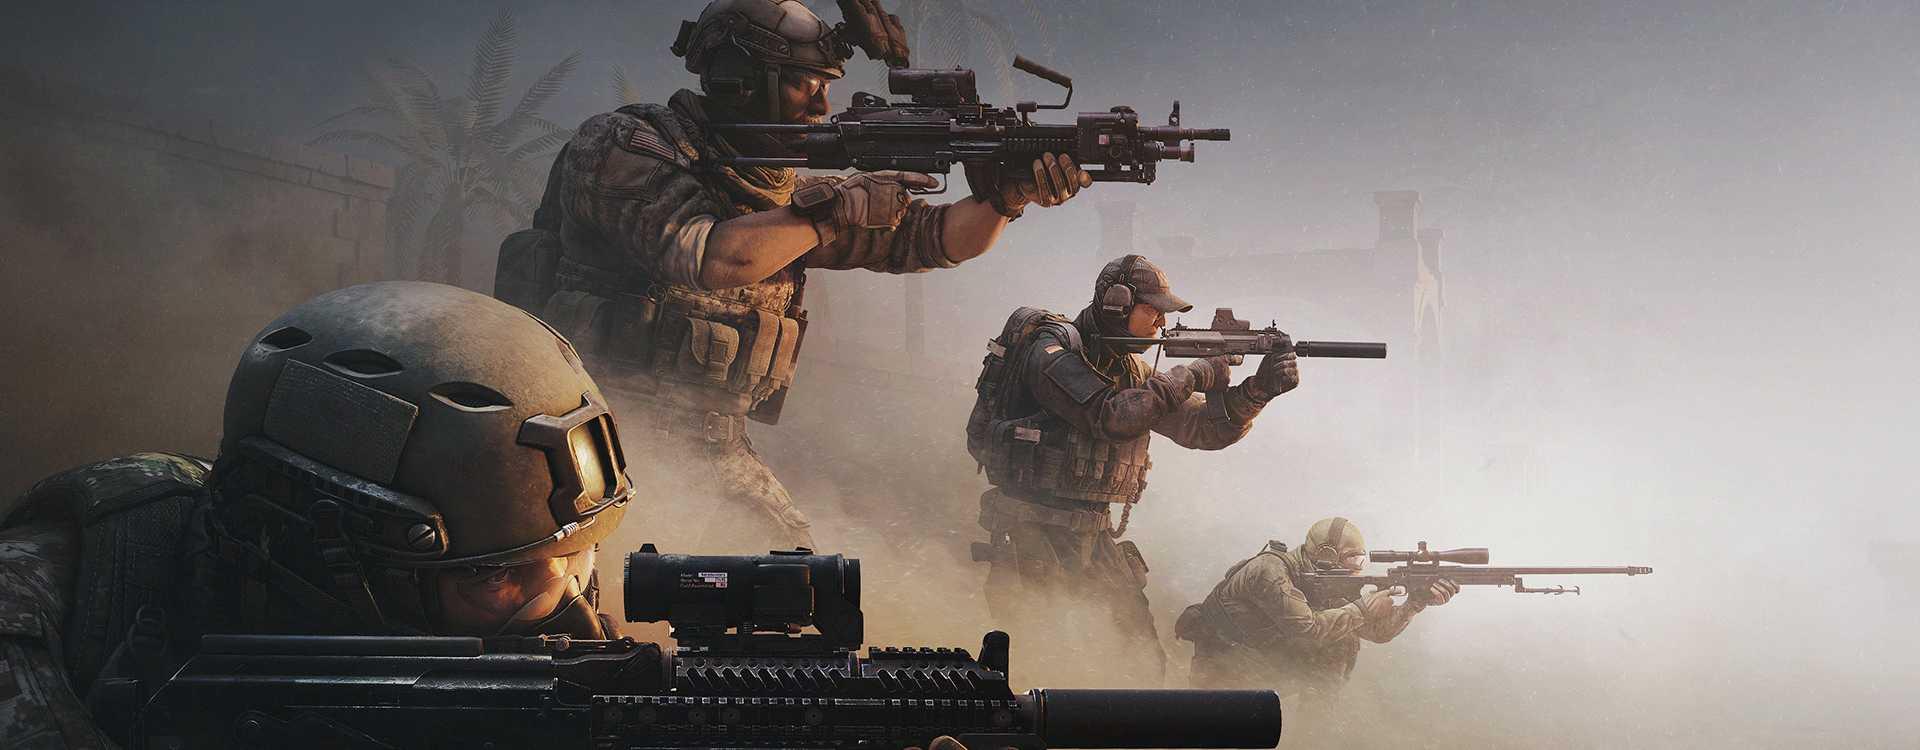 Die 1. Entdeckung der gamescom: der neue Shooter Caliber